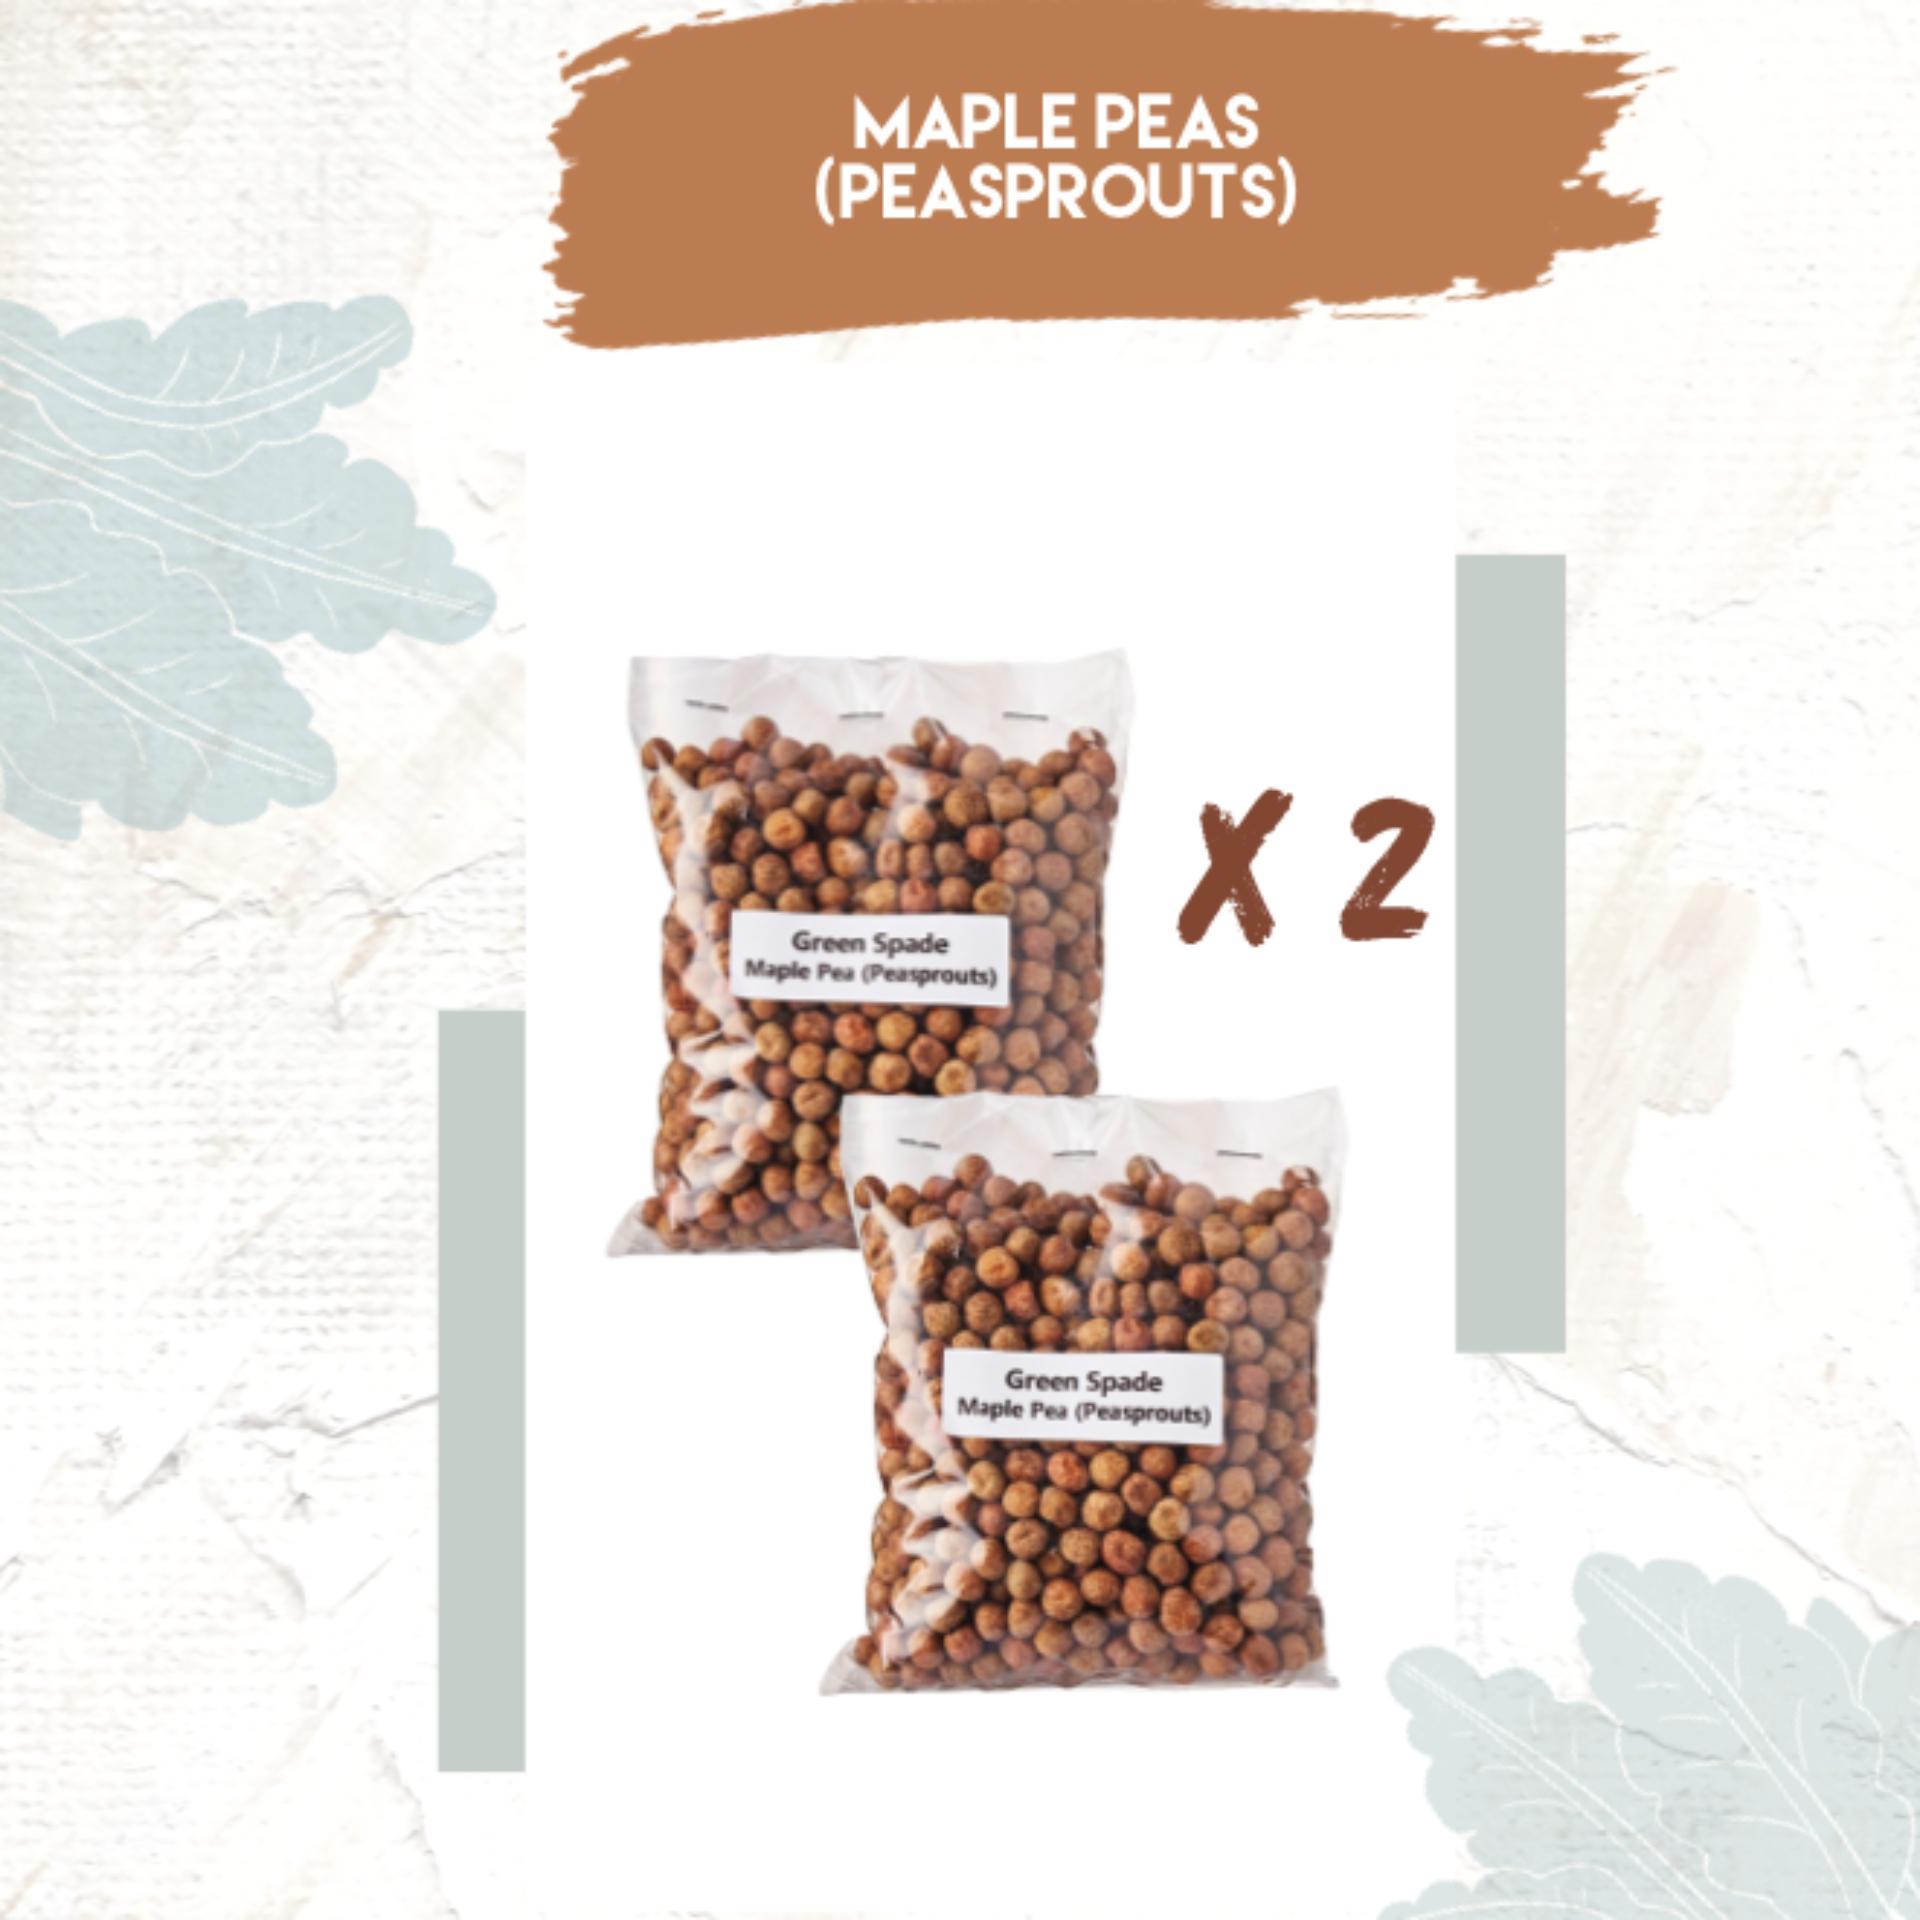 [Bundle] Maple Peas (Pea Sprouts) Microgreen Dou Miao Seeds x 2 PCS - Green Spade